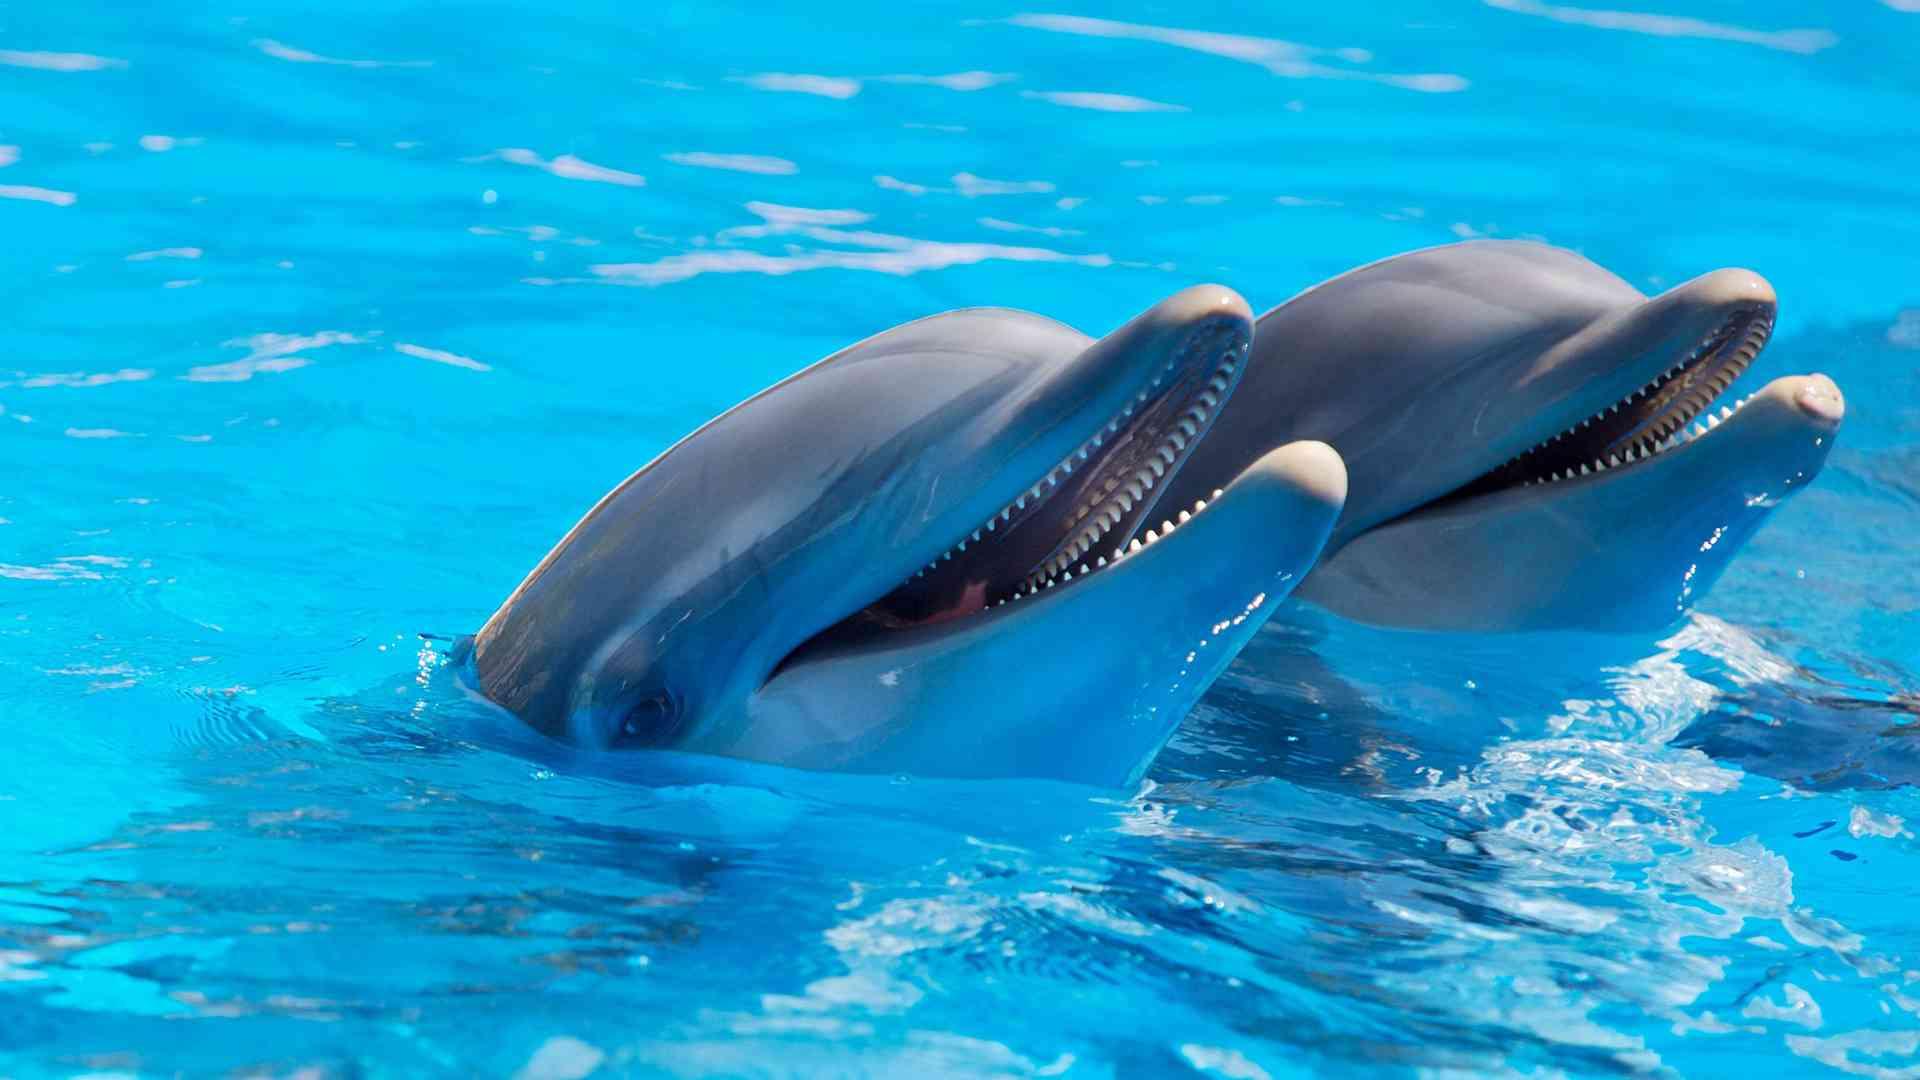 Dolphins. Killer whales. France. Breeding. Ban.